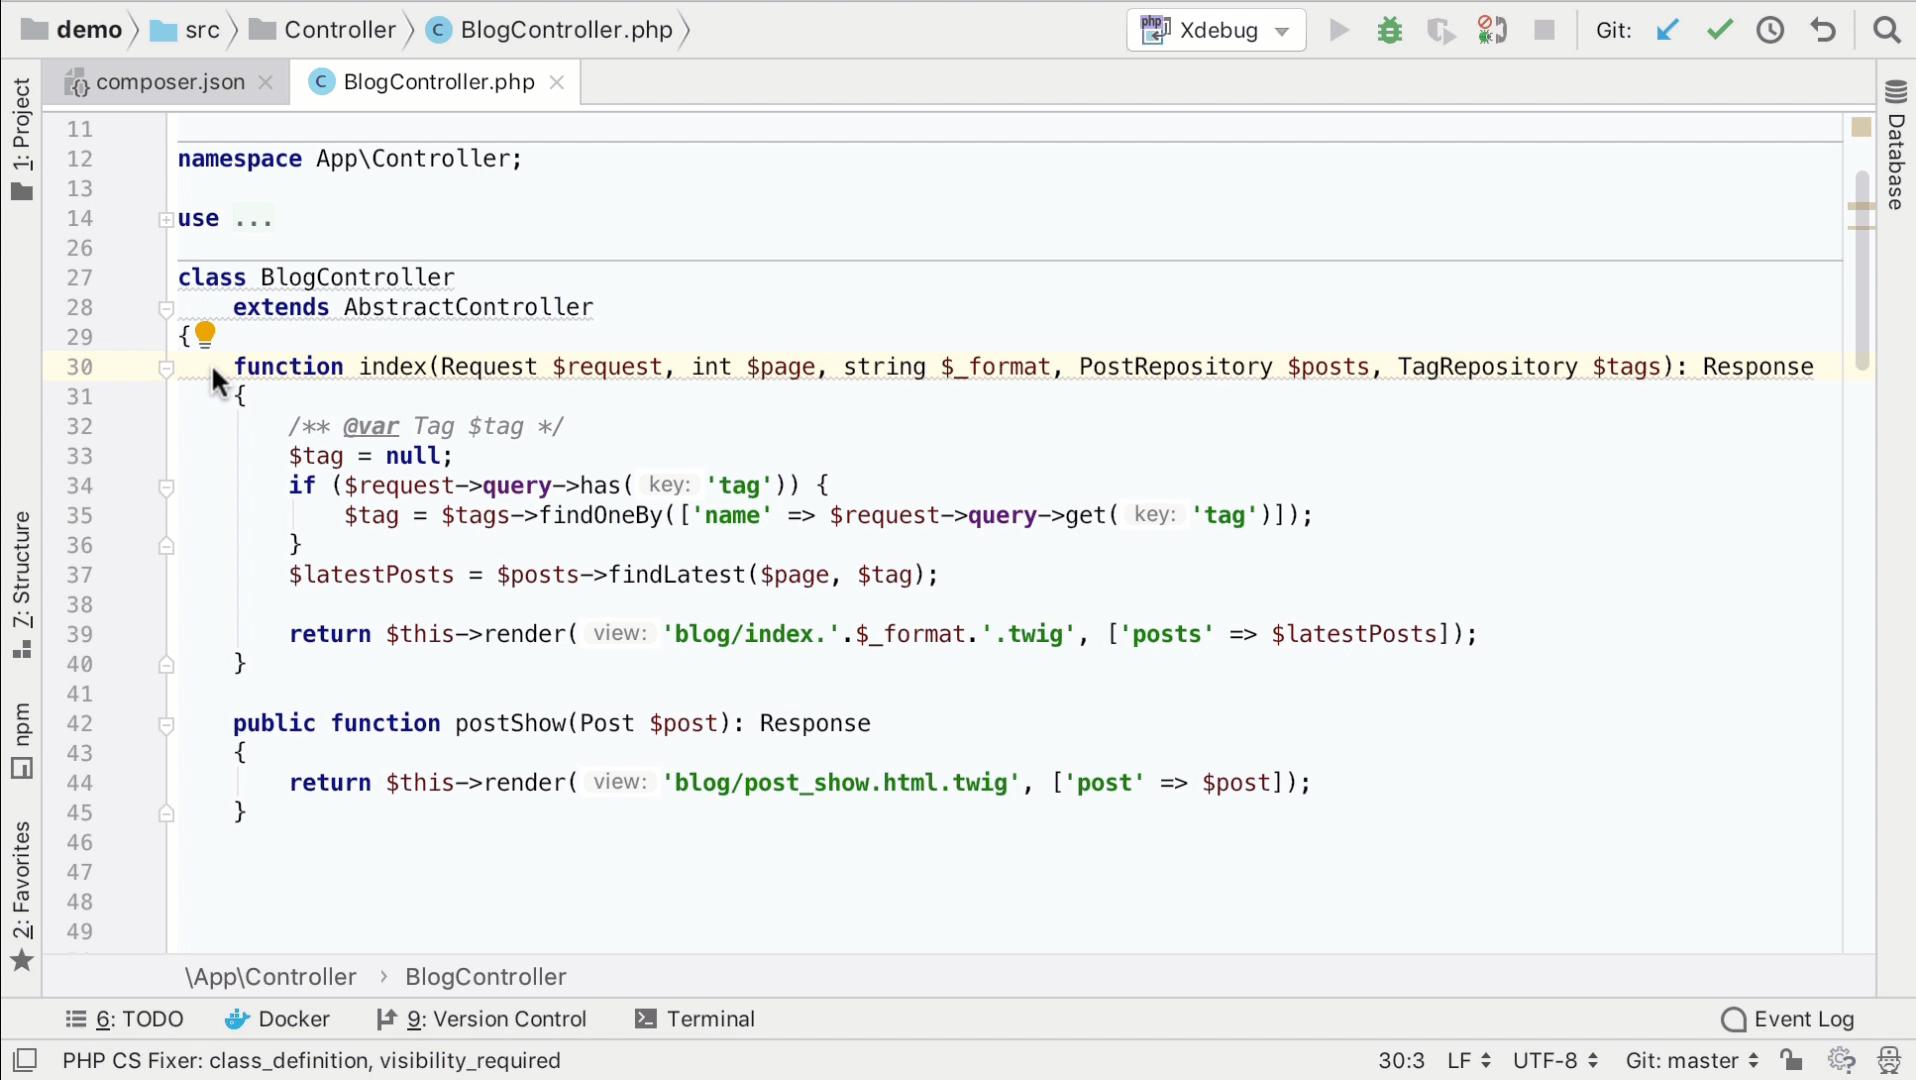 PHP CS Fixer fix file